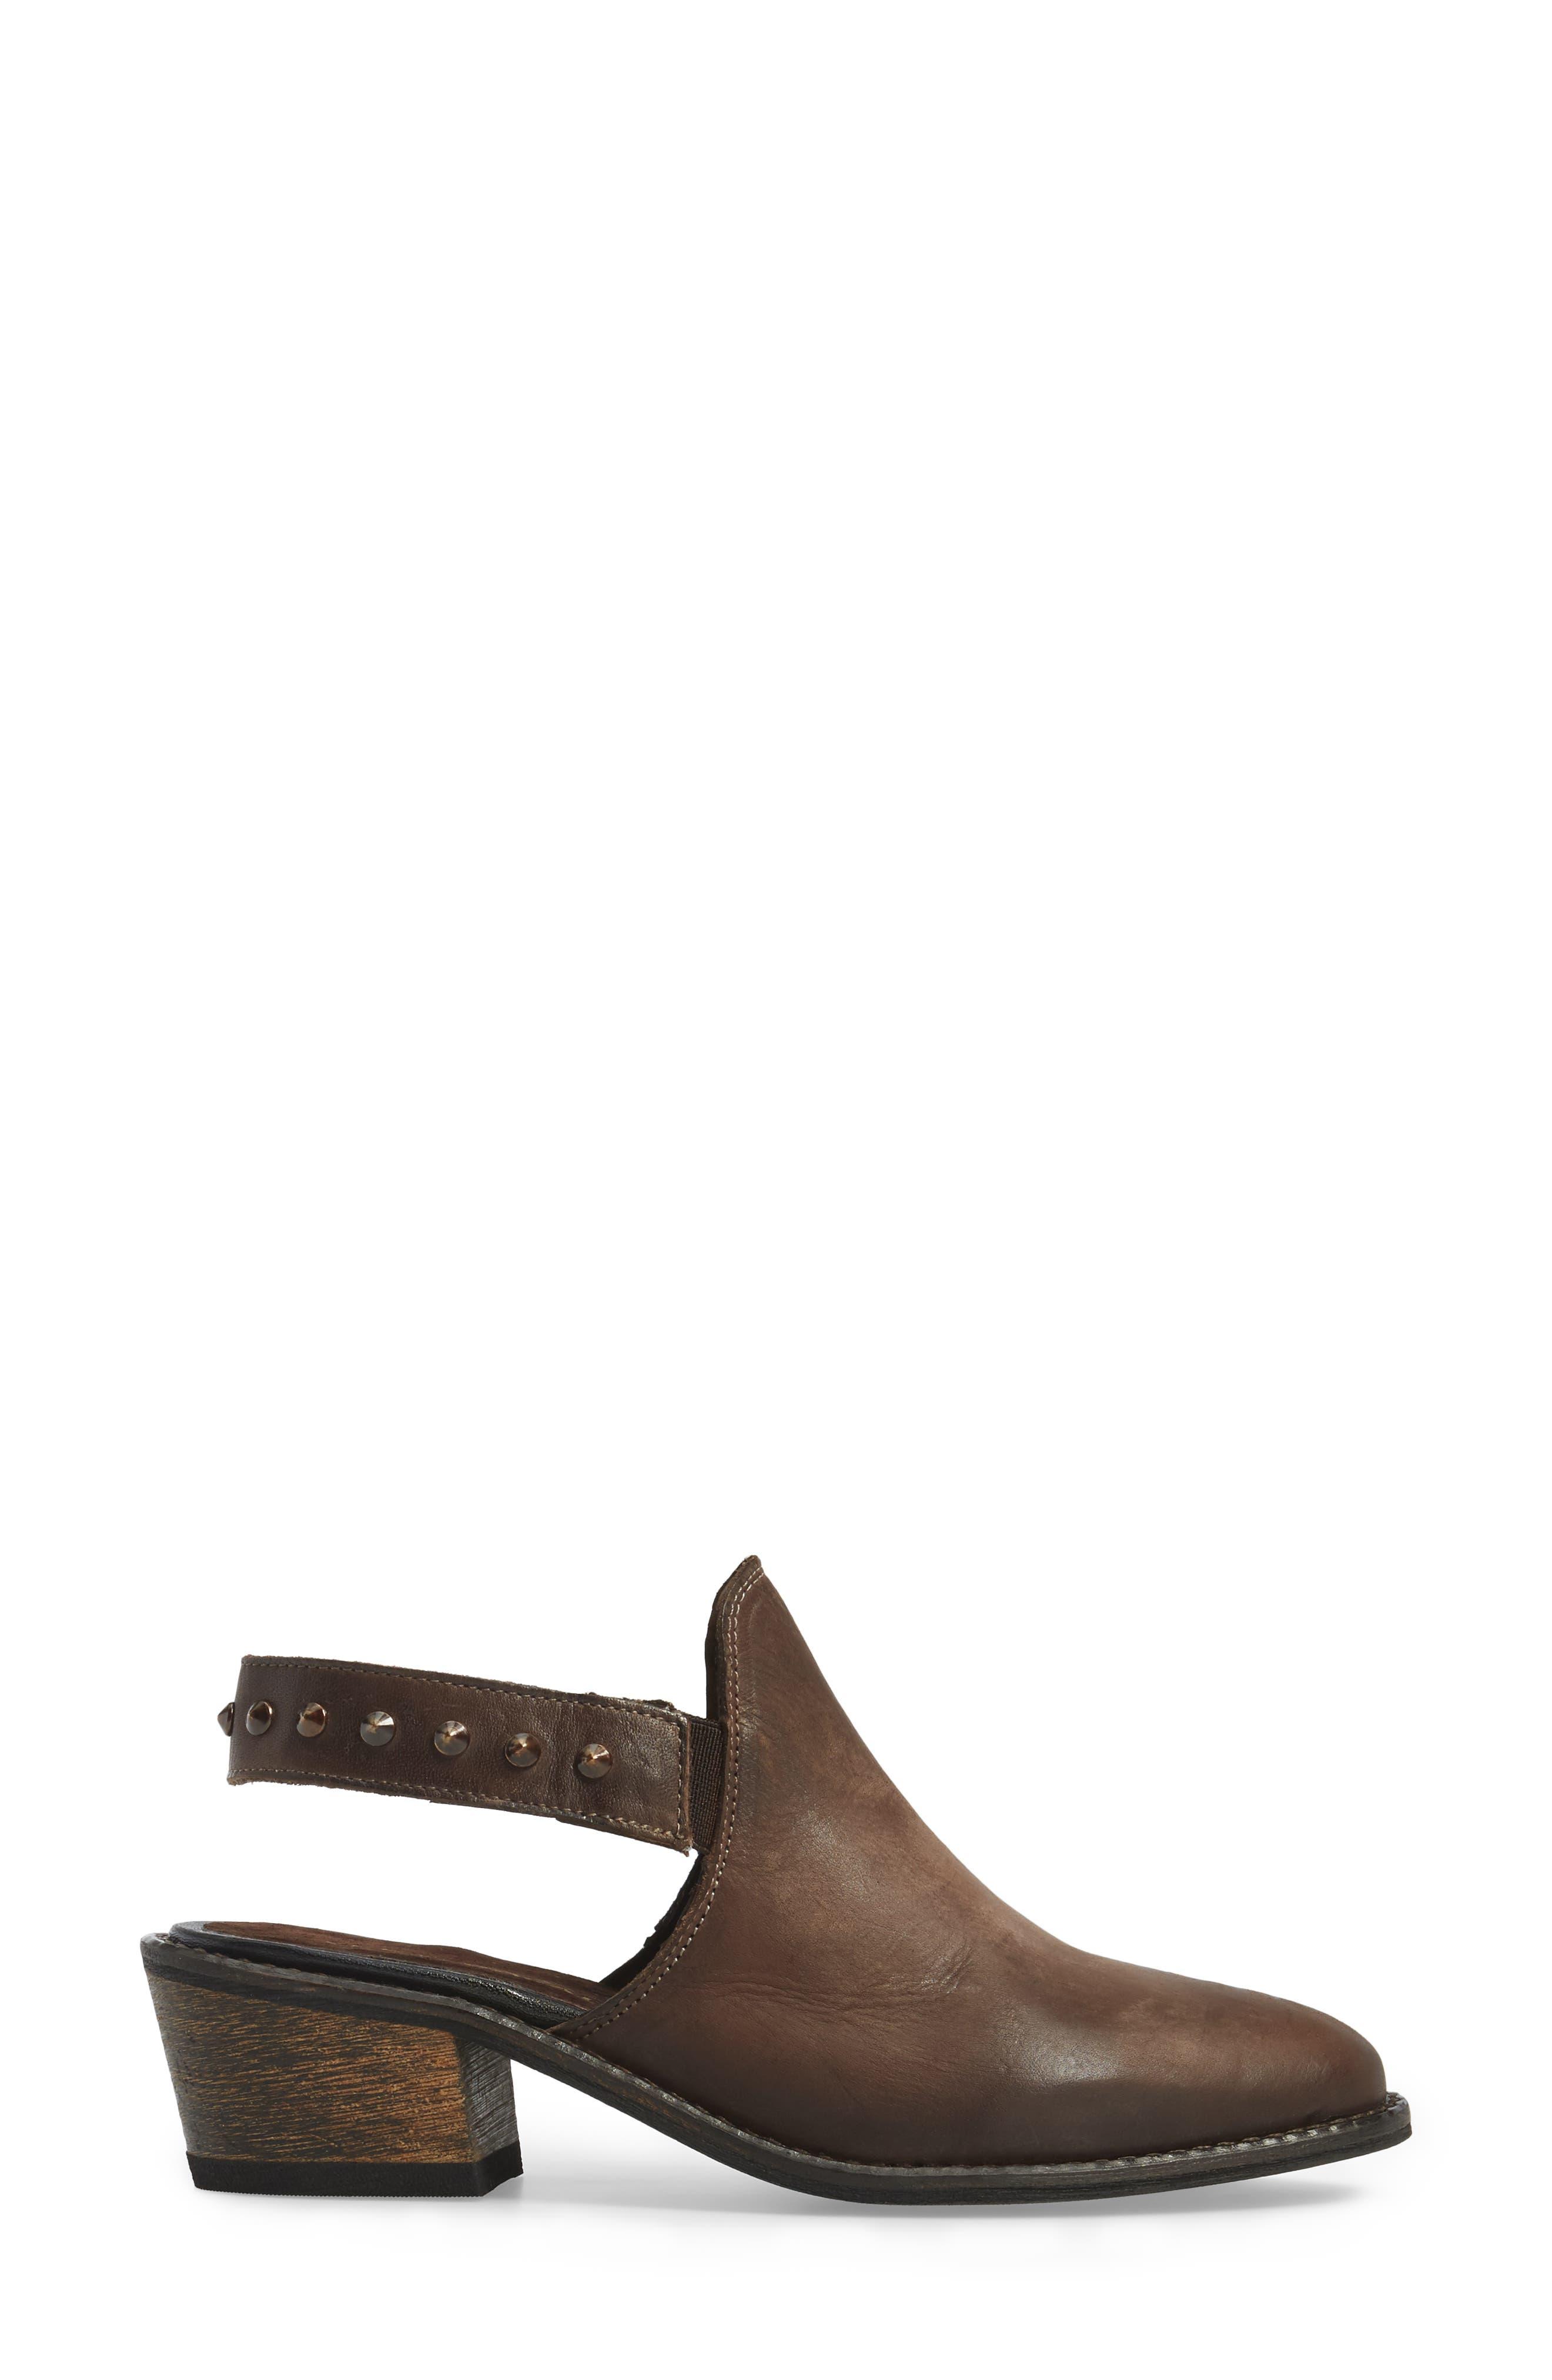 Adamo Studded Slingback Mule,                             Alternate thumbnail 5, color,